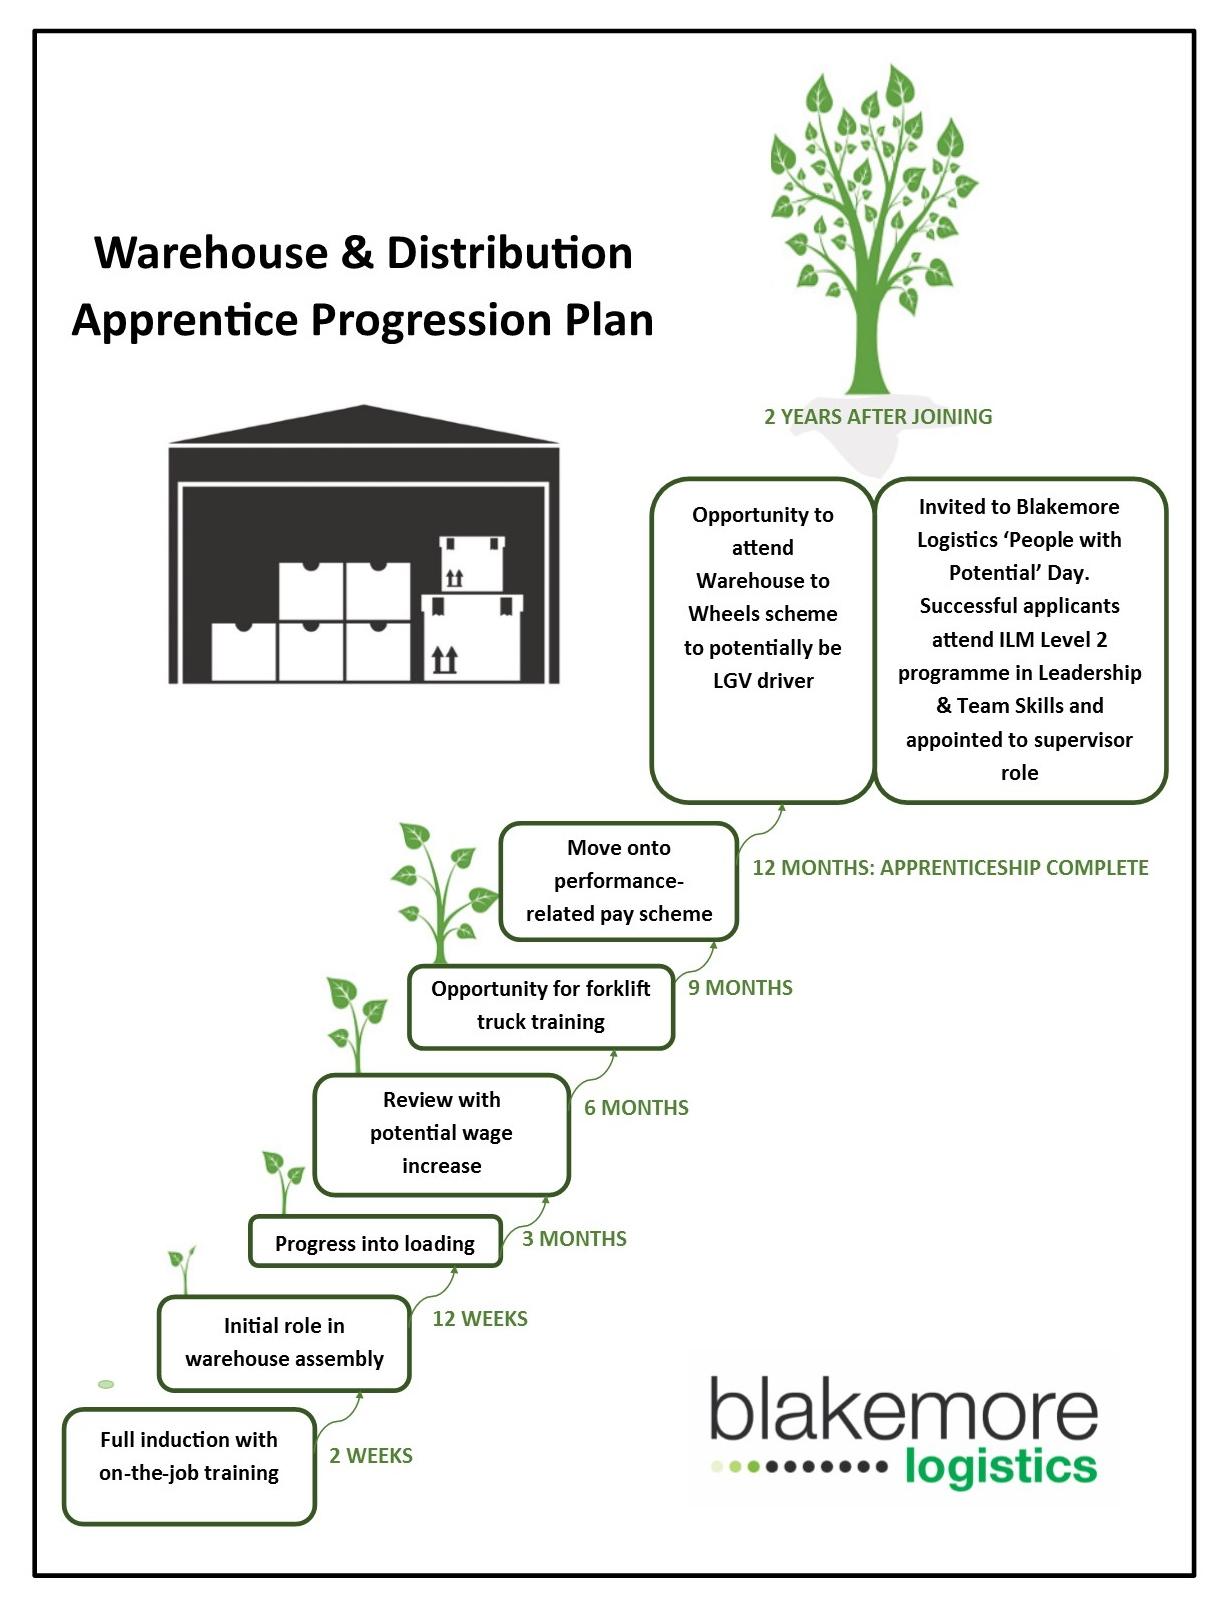 Warehouse_Distribution_Apprentice_Progression_Plan